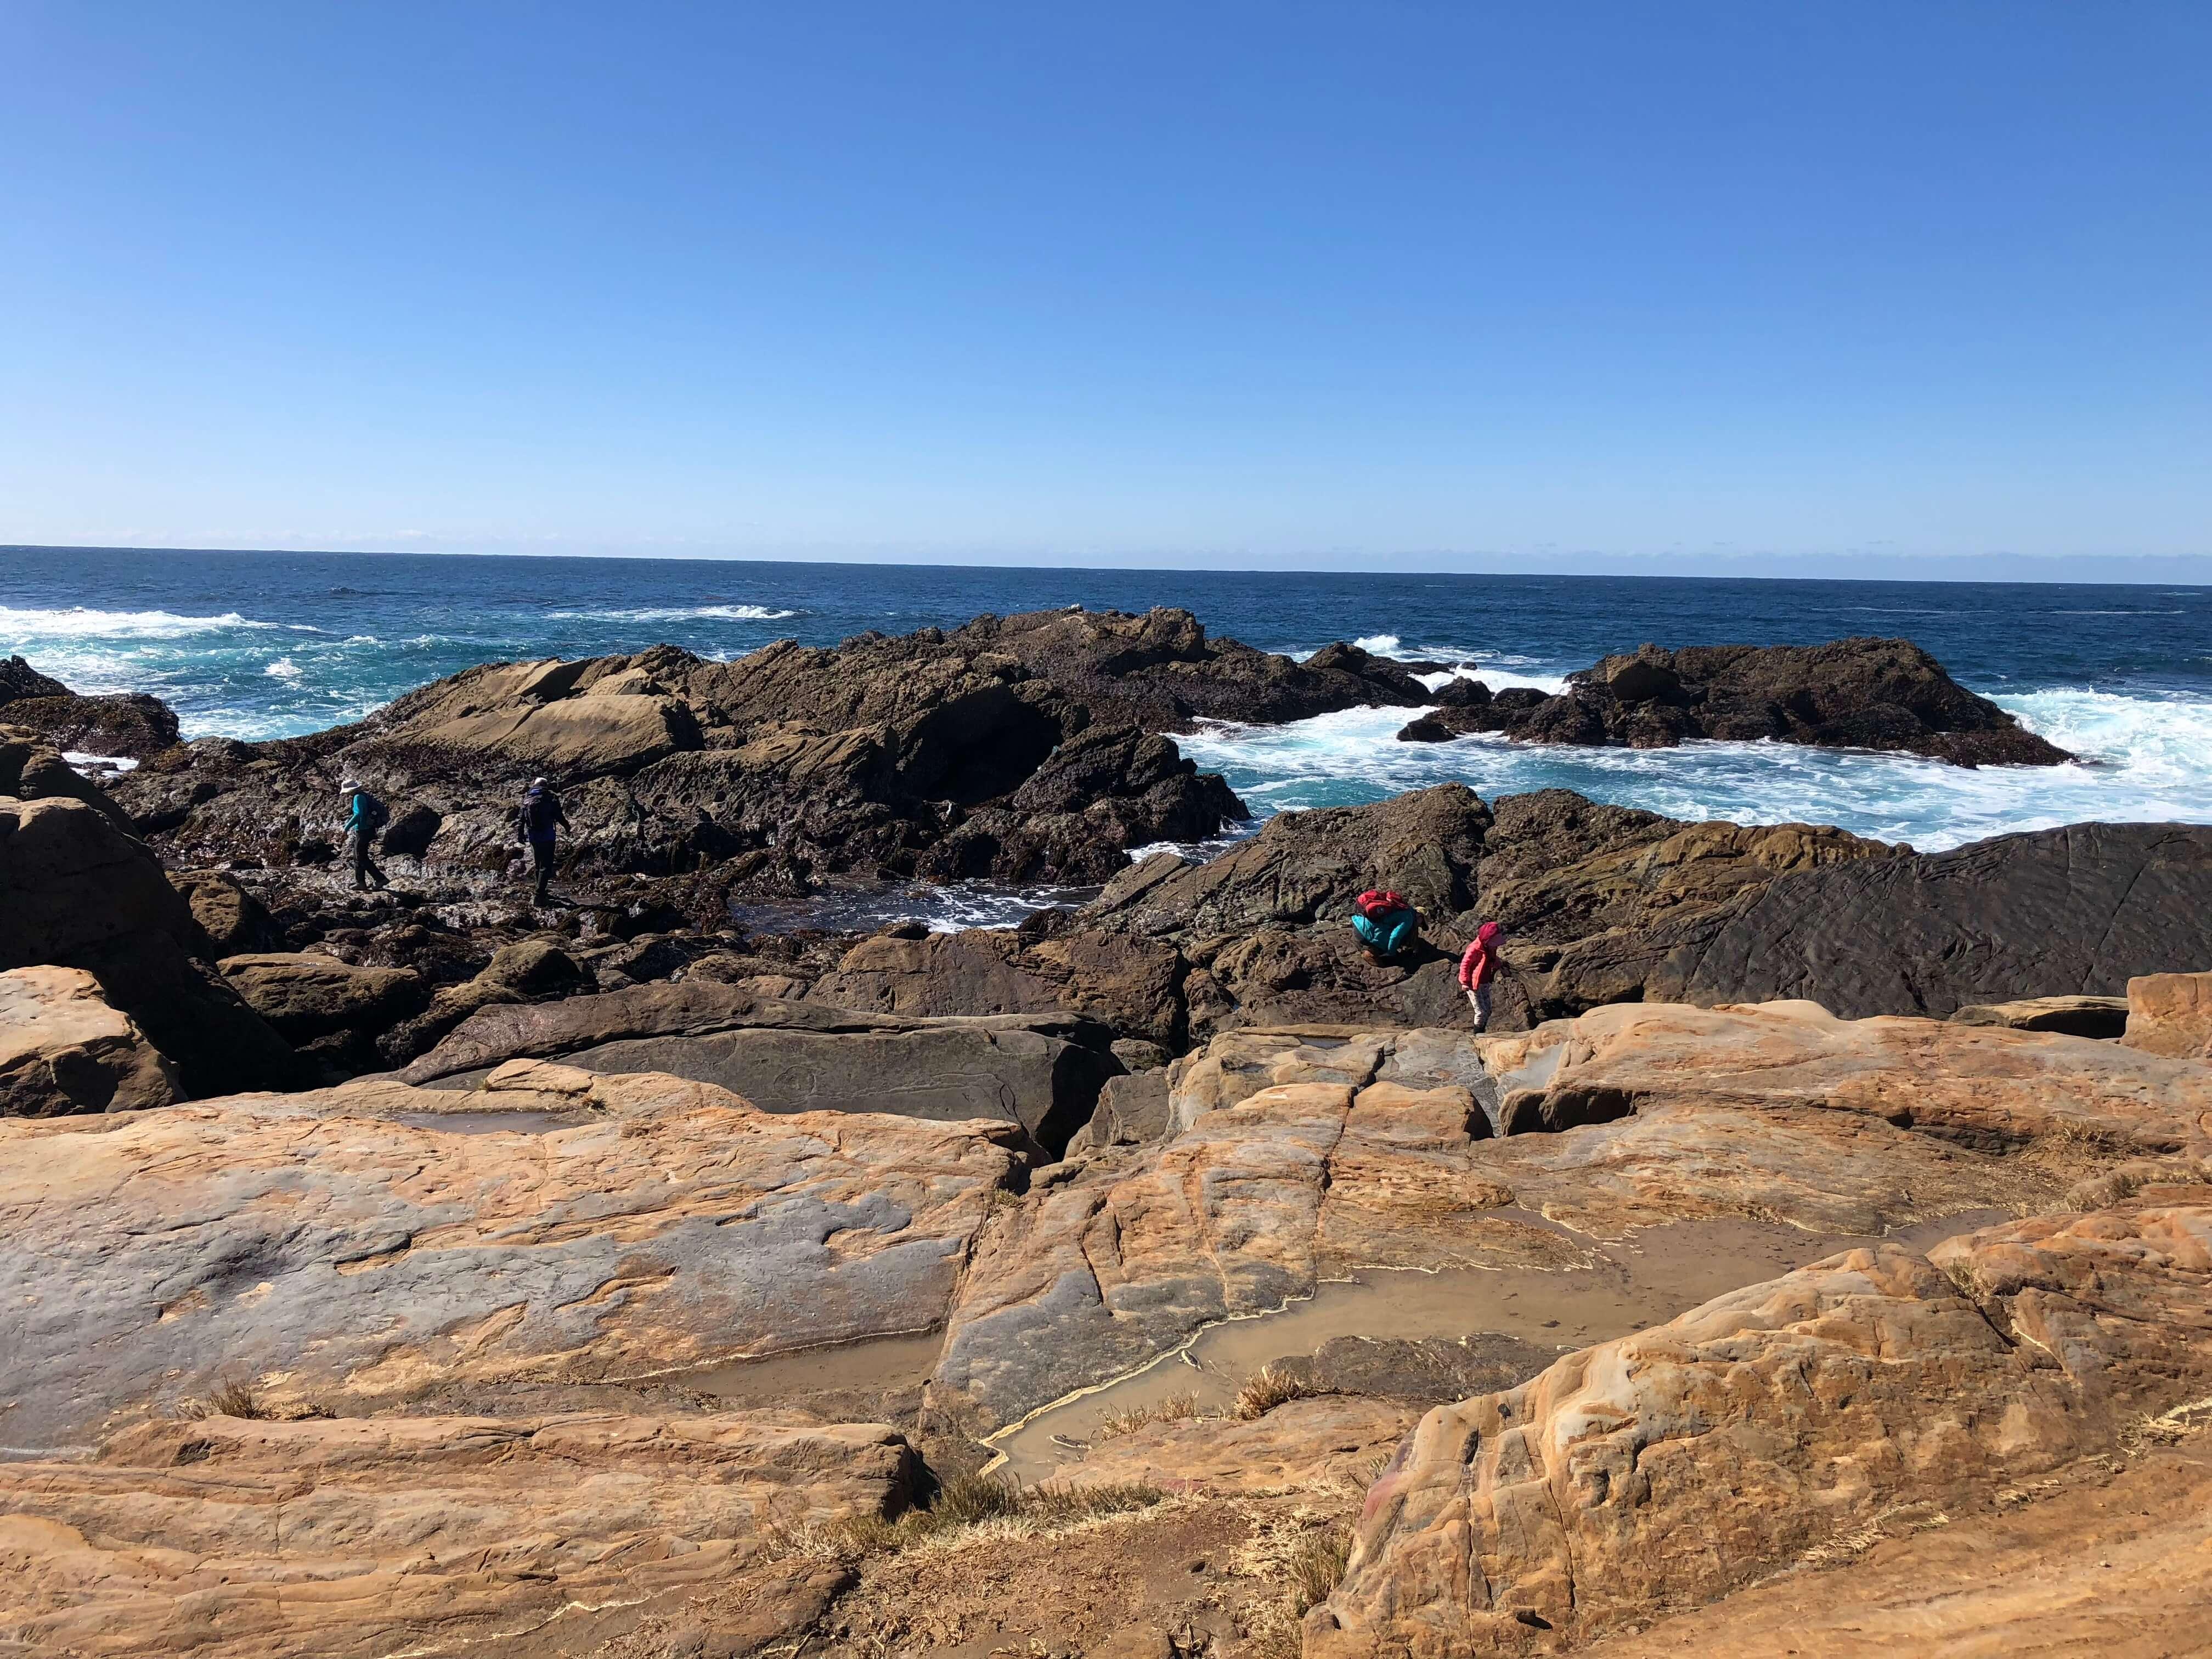 carmel-by-the-sea point lobos state reserve rocks